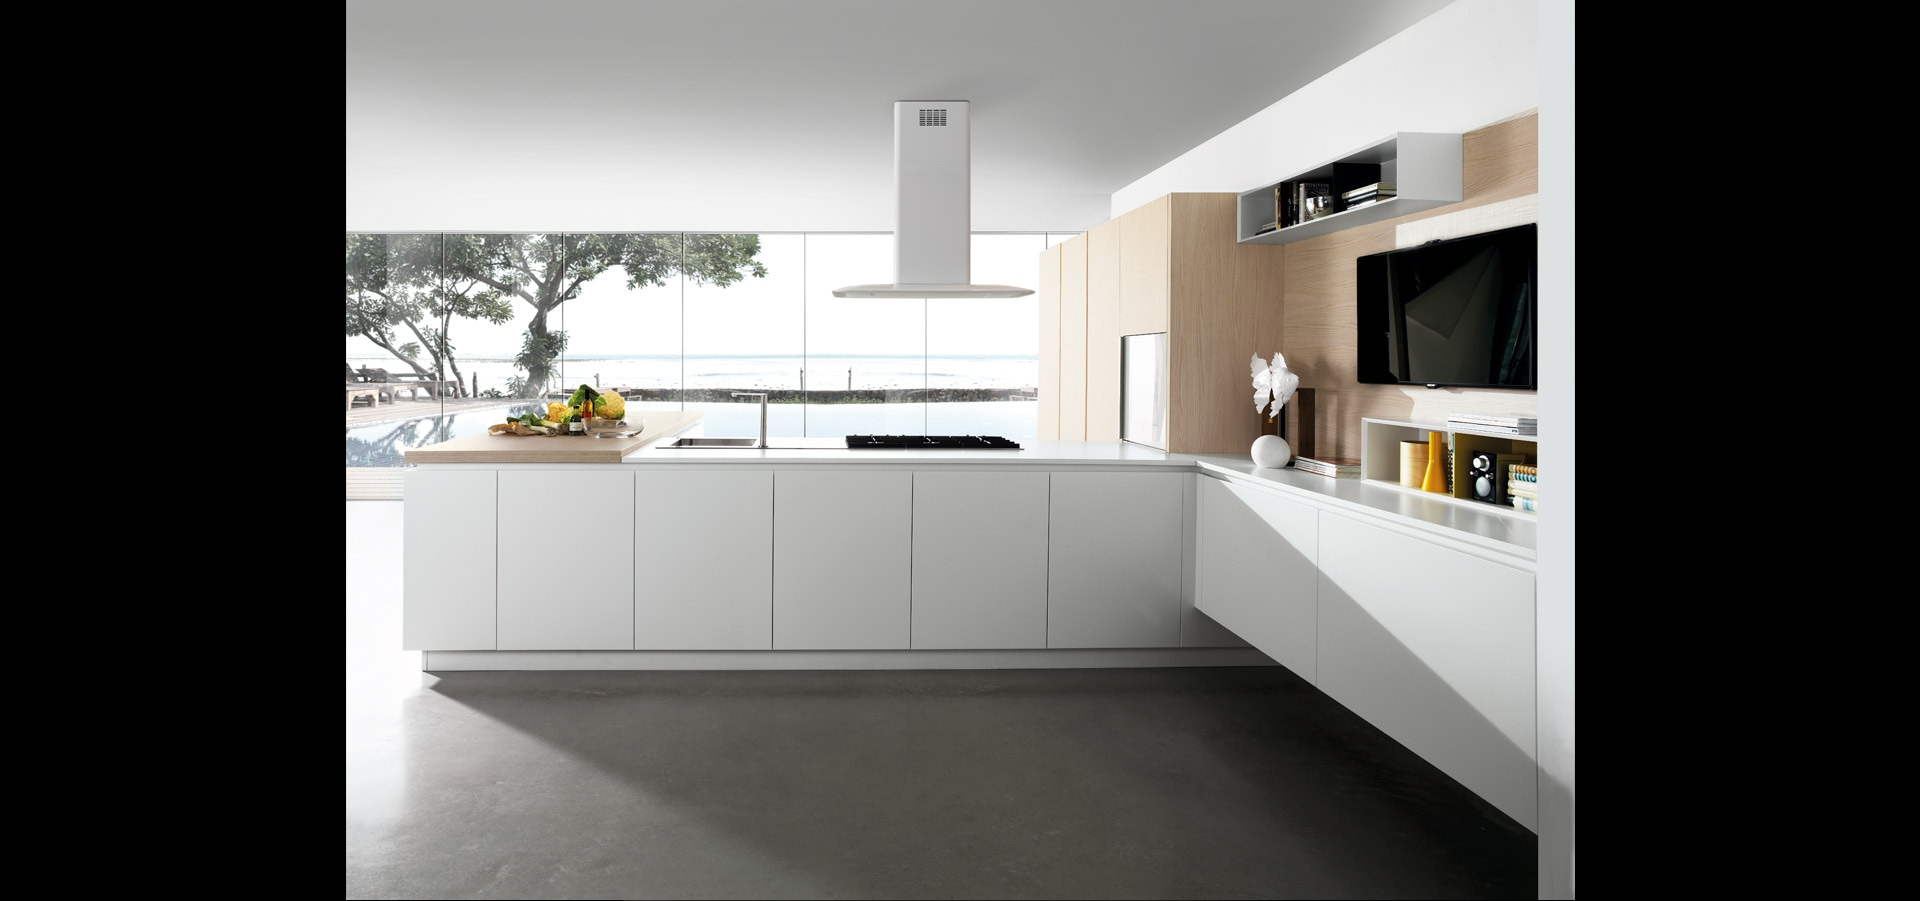 Cucina minimal Made in Italy | Limha Matt | MITON Cucine